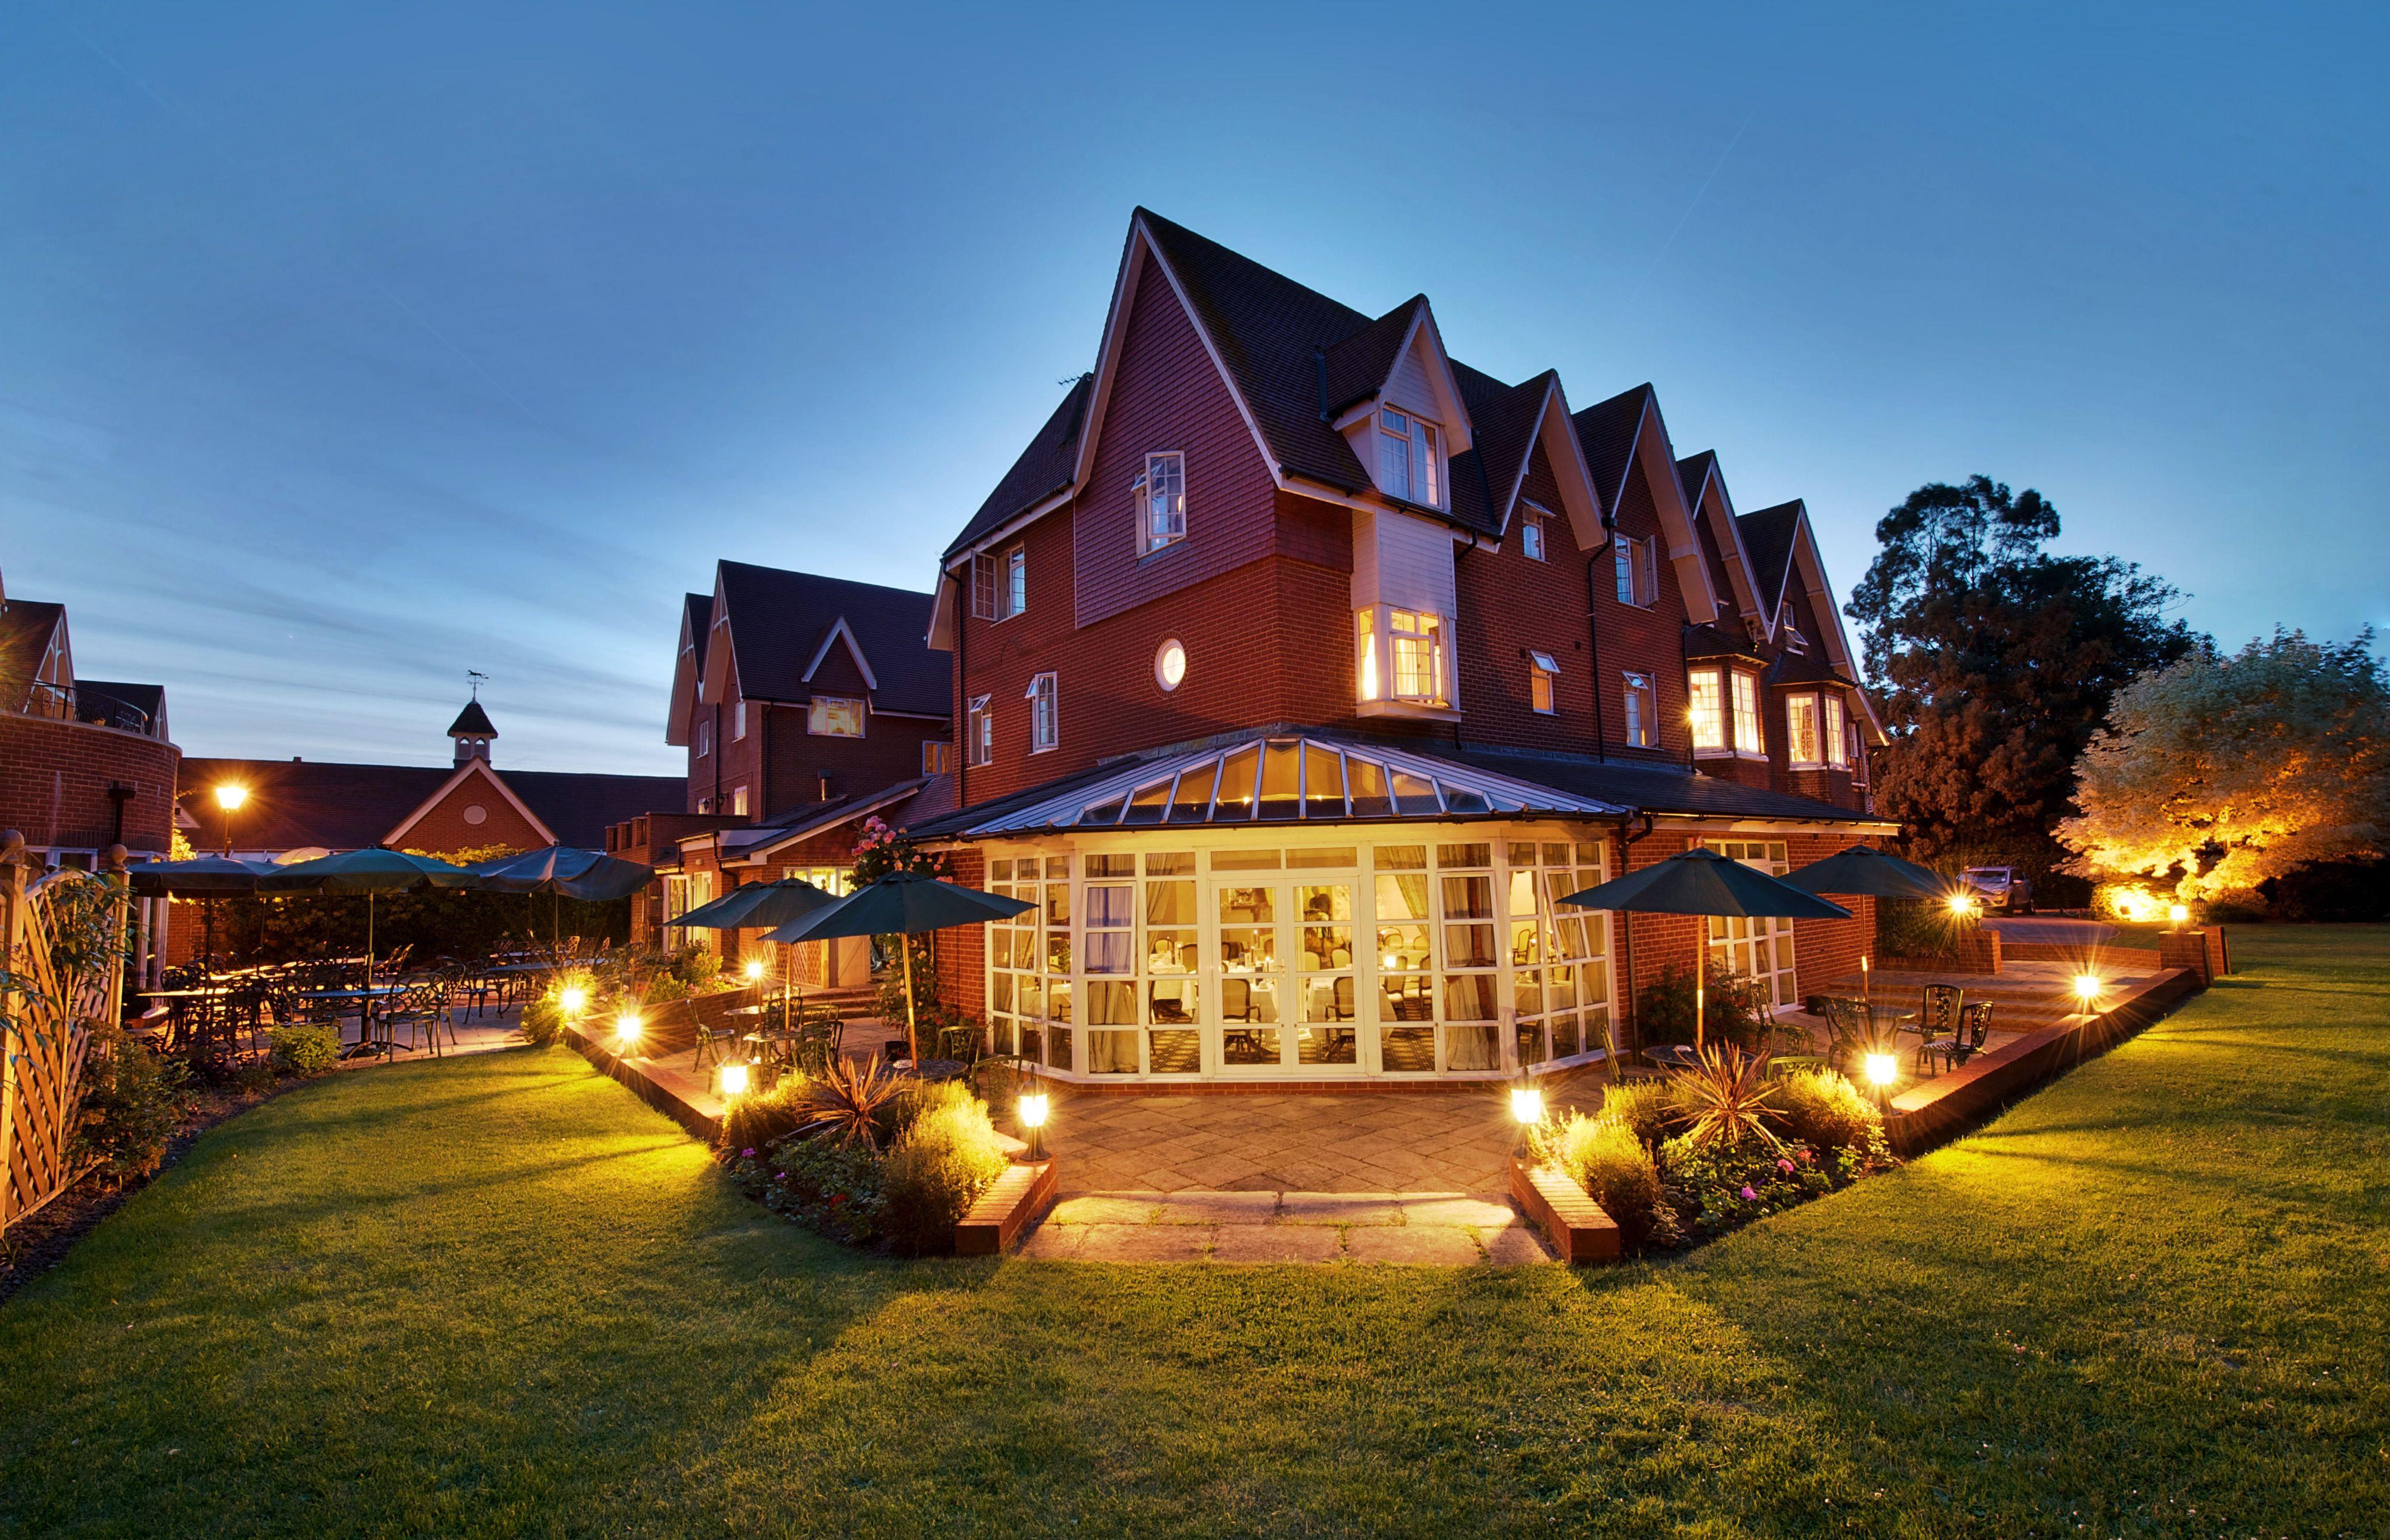 Hempstead House Hotel Spa At Night Bapchild Kent United Kingdom